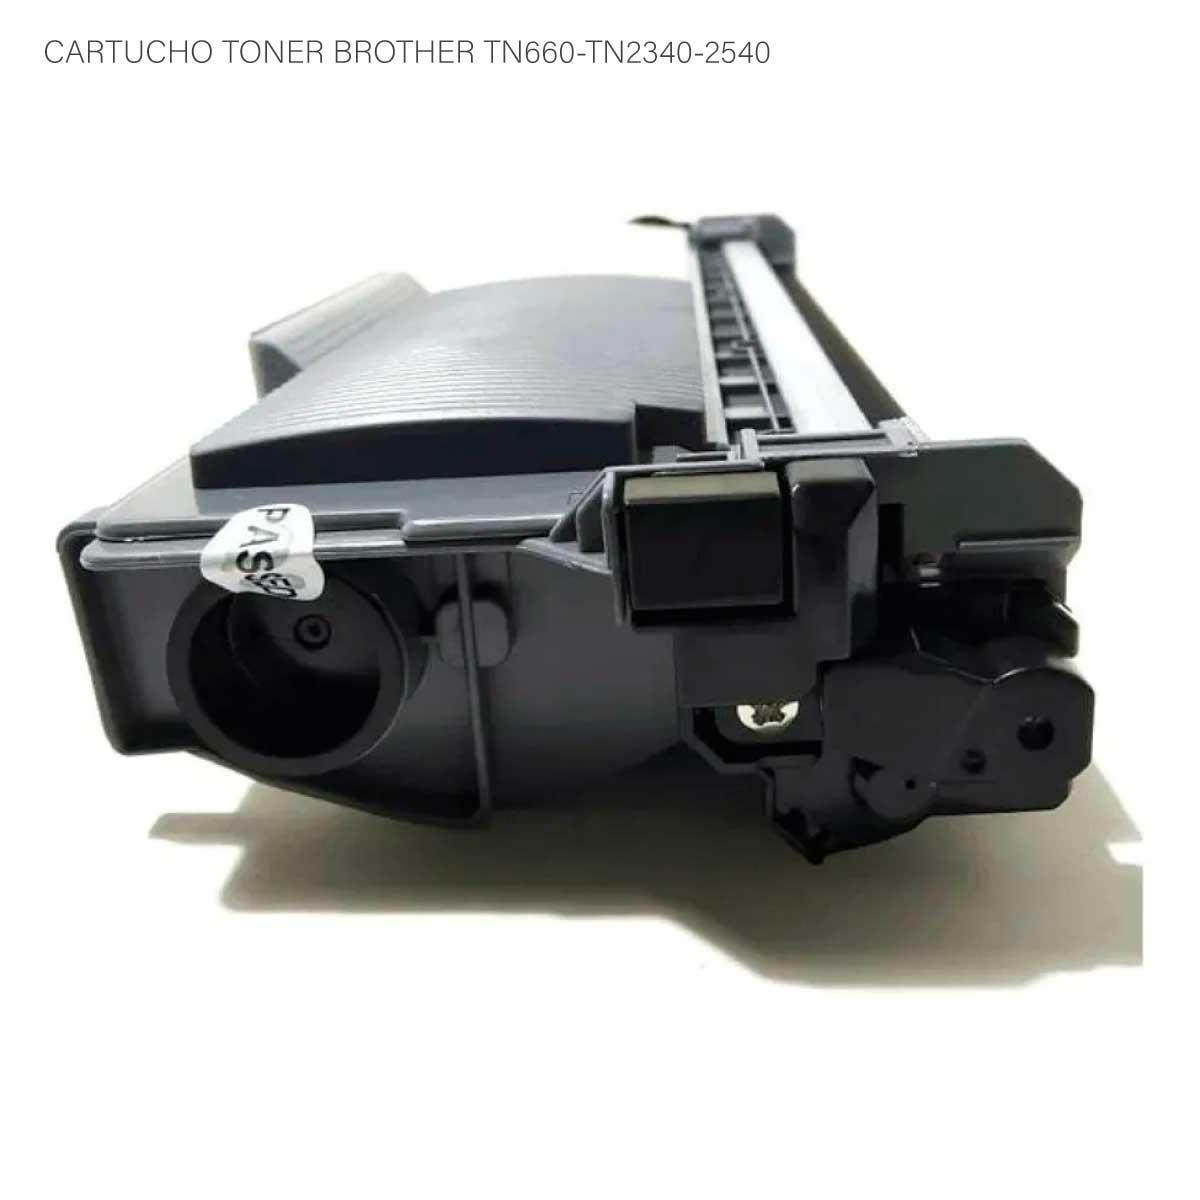 Cartucho Compatível Para Uso Impressora TN-2370 / TN-2340 / TN-660